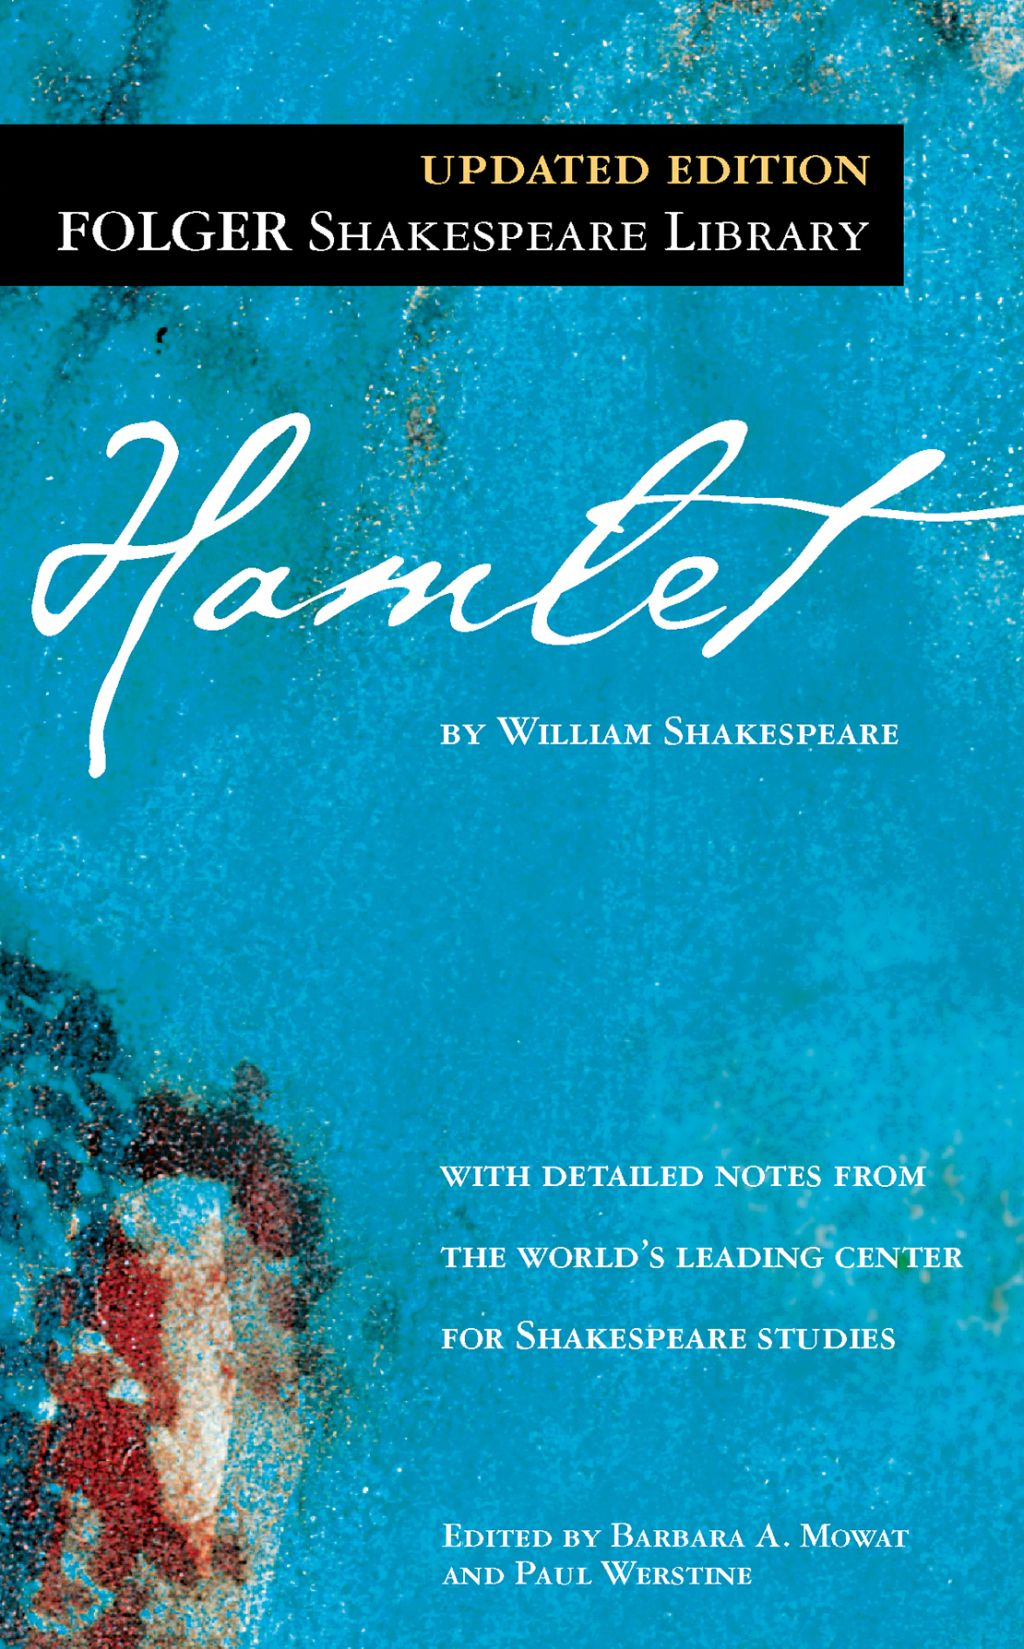 Ebook Of Shakespeare